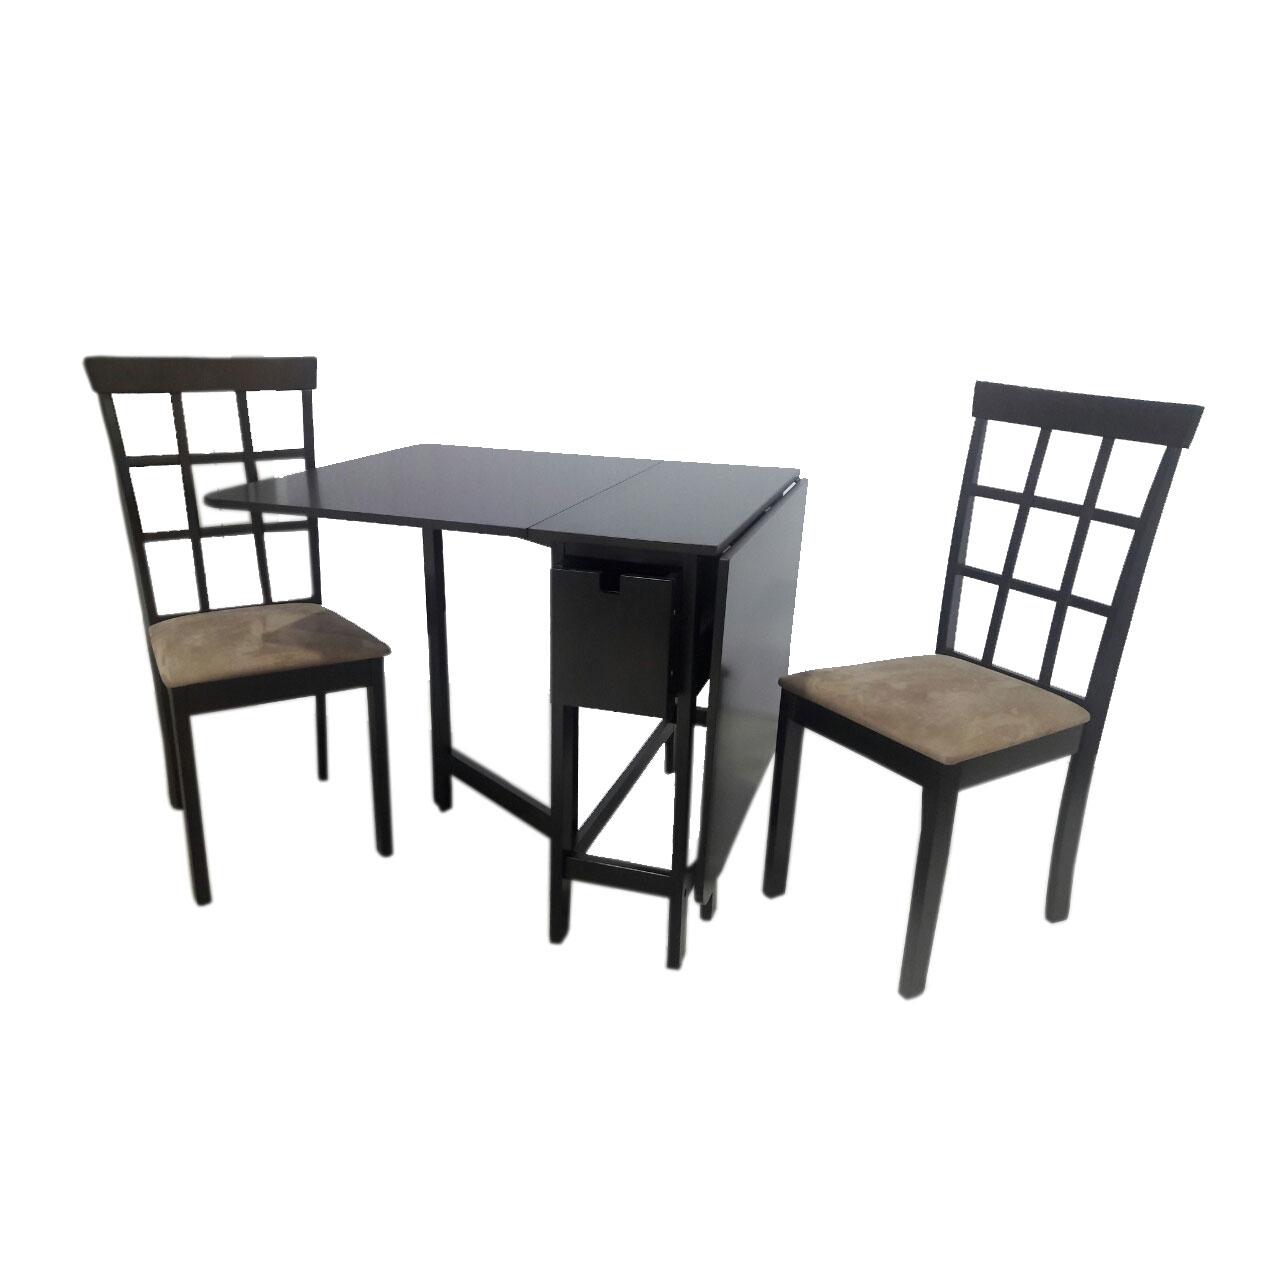 Donna Dining Set Furniture Store Manila Philippines  : MIAMI GATELEG BLACK from www.urbanconcepts.ph size 1280 x 1280 jpeg 77kB